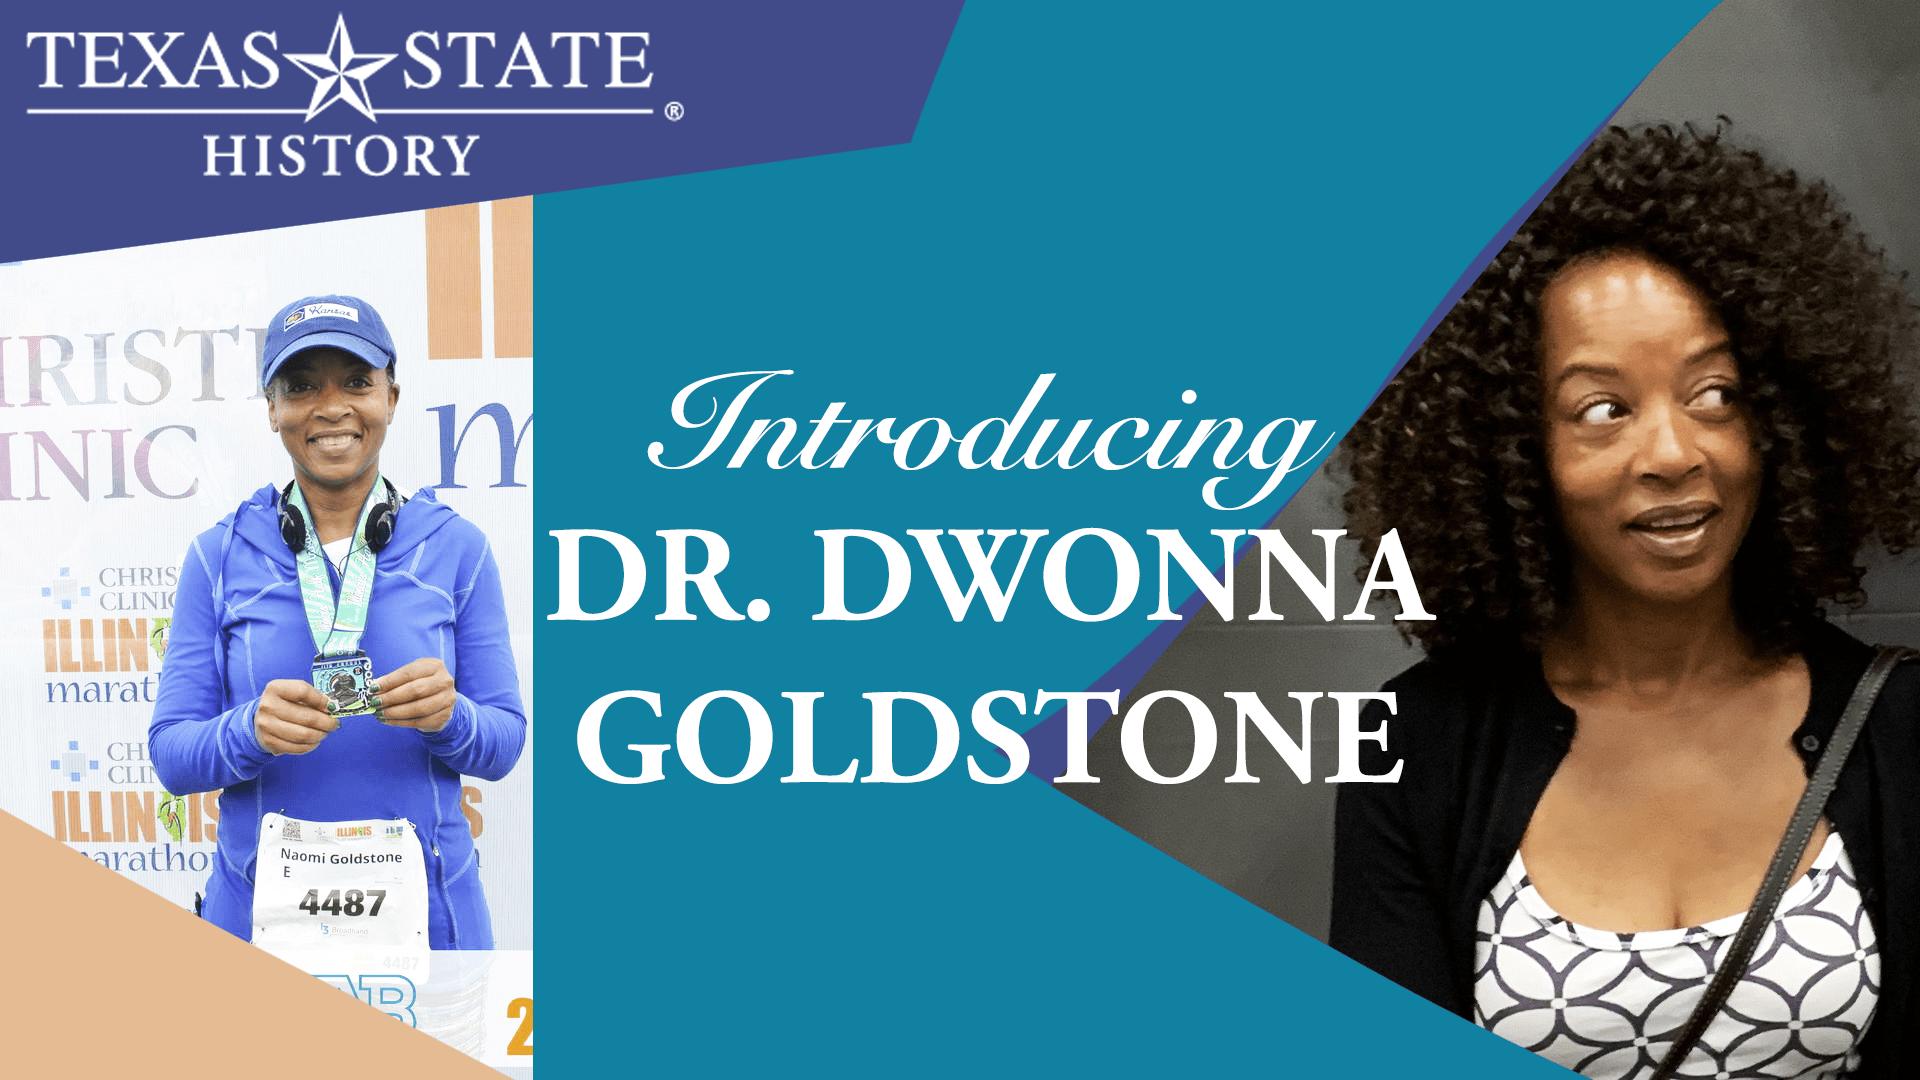 Photo of Dr. Dwonna Goldstone